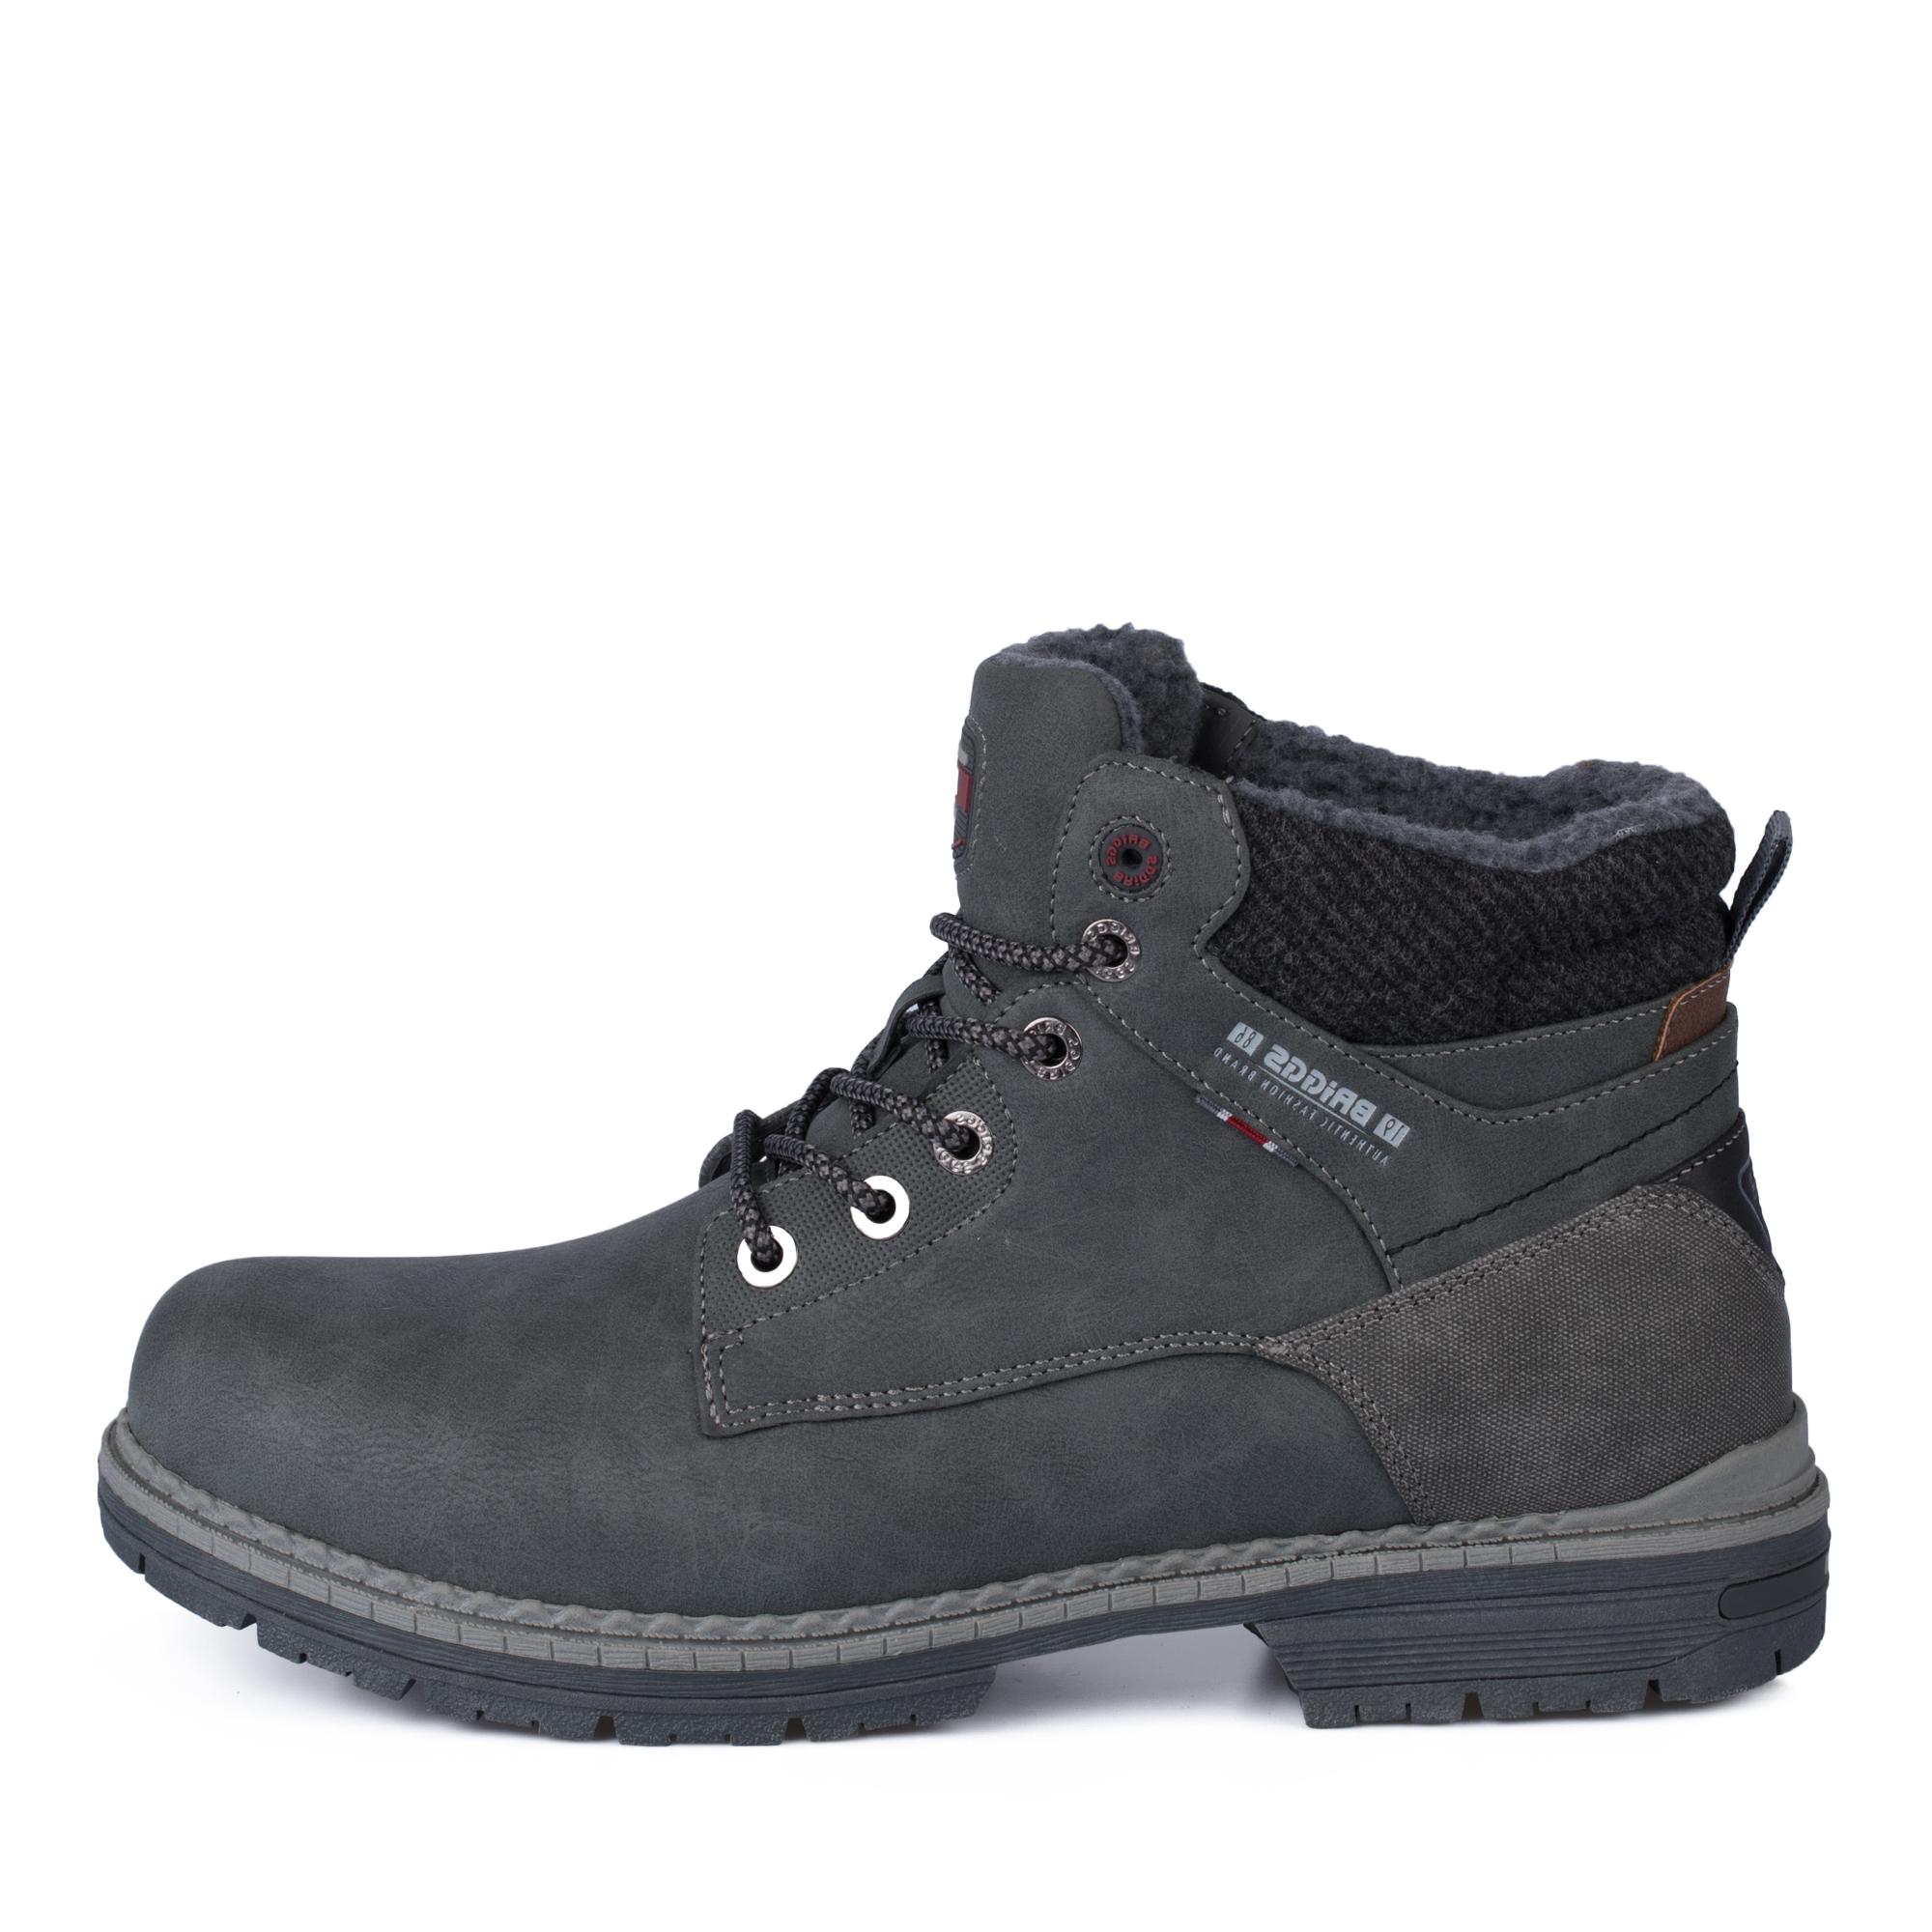 Ботинки BRIGGS 018-104B-4610